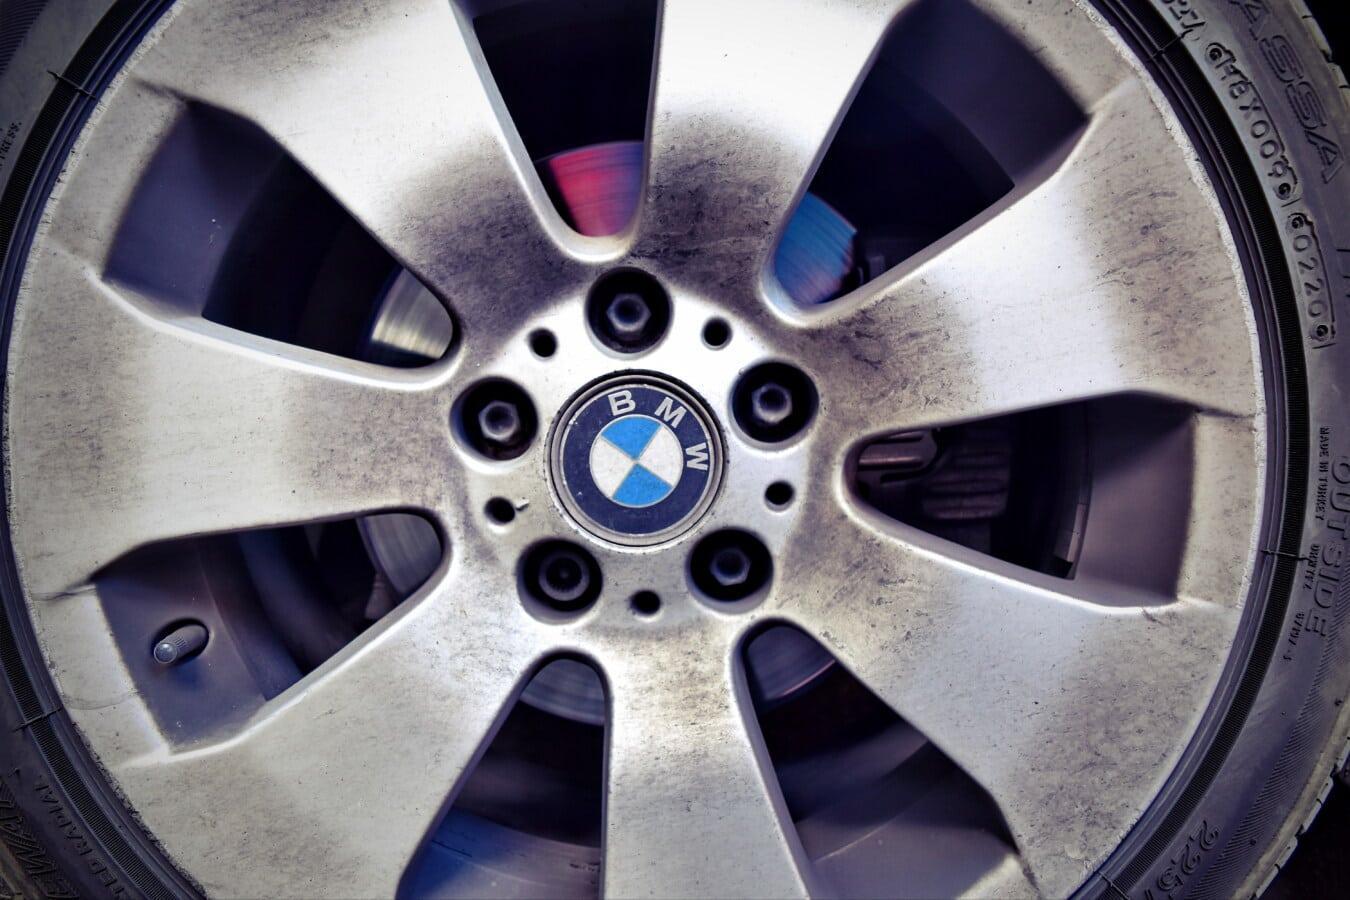 alloy, rim, aluminum, tire, machine, wheel, vehicle, car, steel, chrome